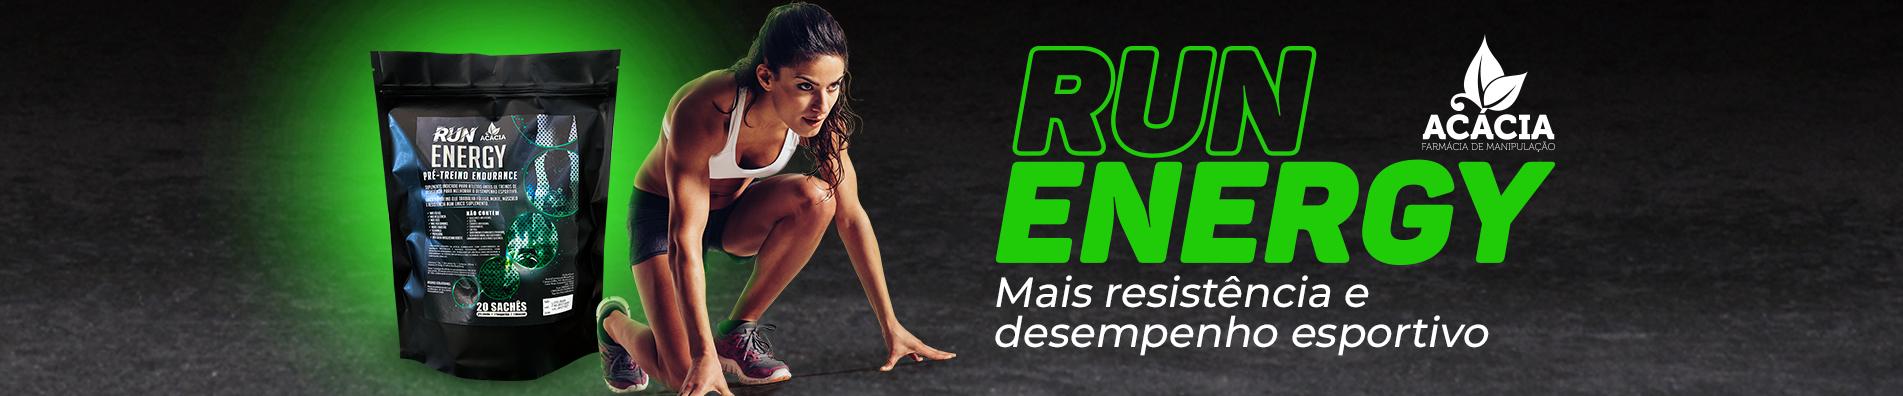 Run Energy